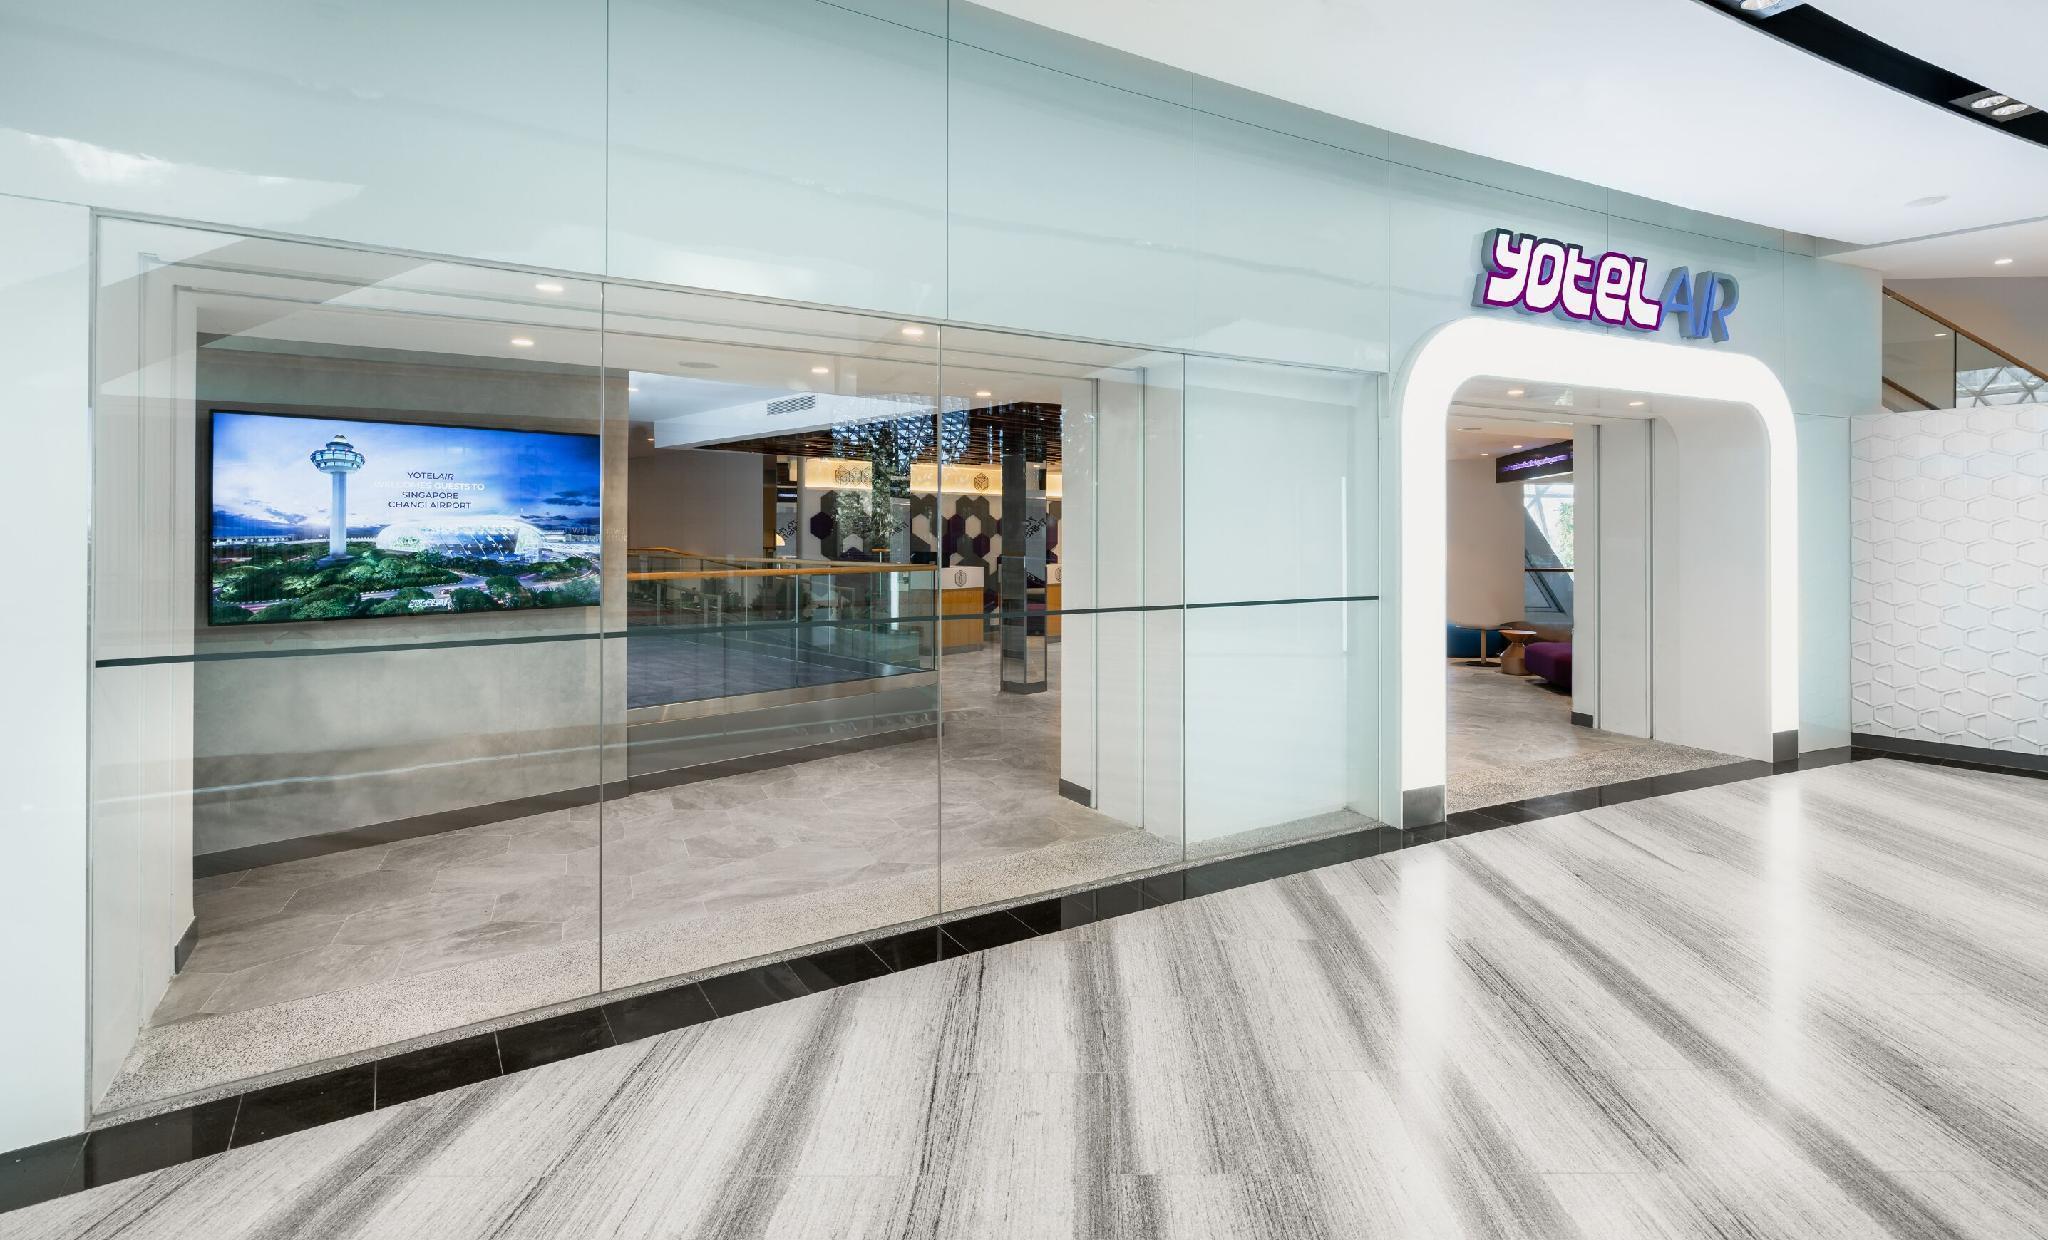 Yotelair Singapore Changi Airport At Jewel Room Deals